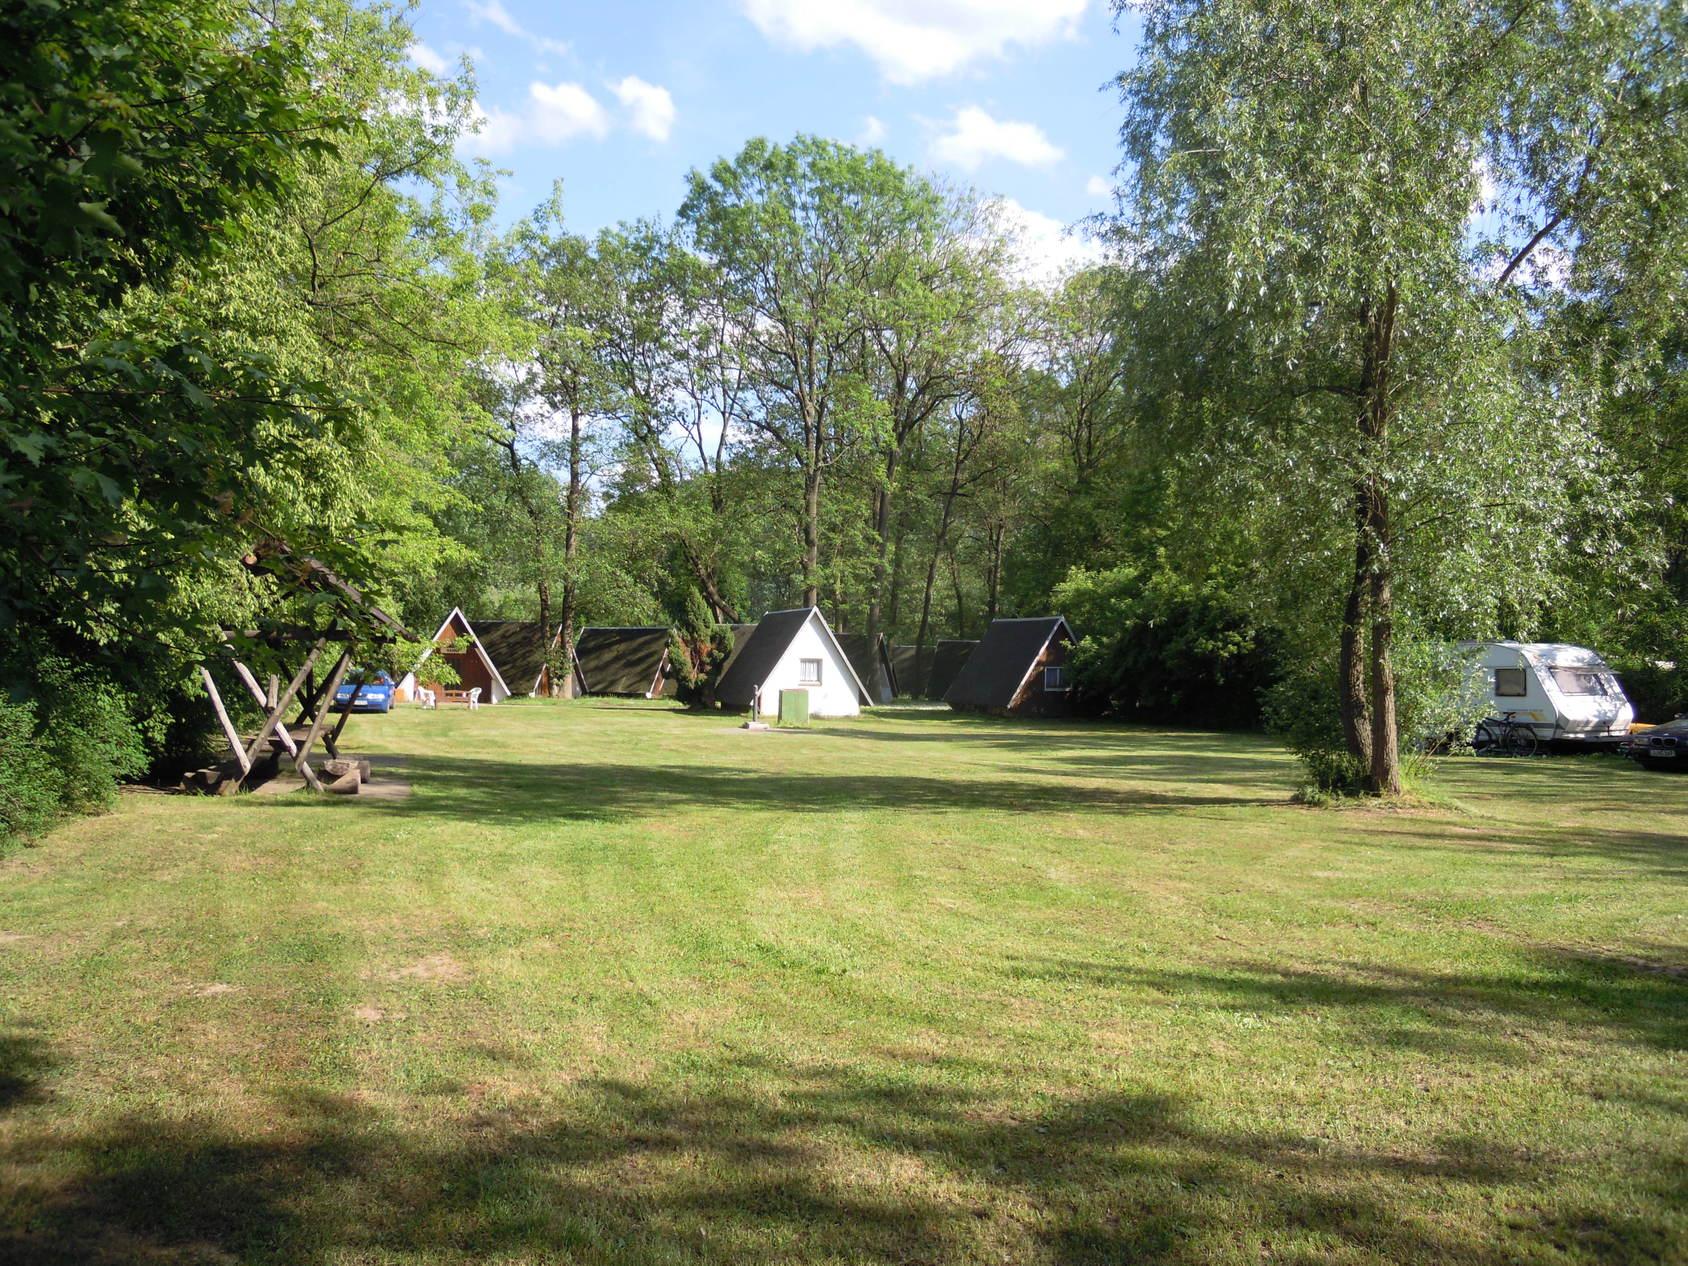 Duitsland-Porstendorf-Camping%20Bei%20Jena-ExtraLarge Campings Duitsland